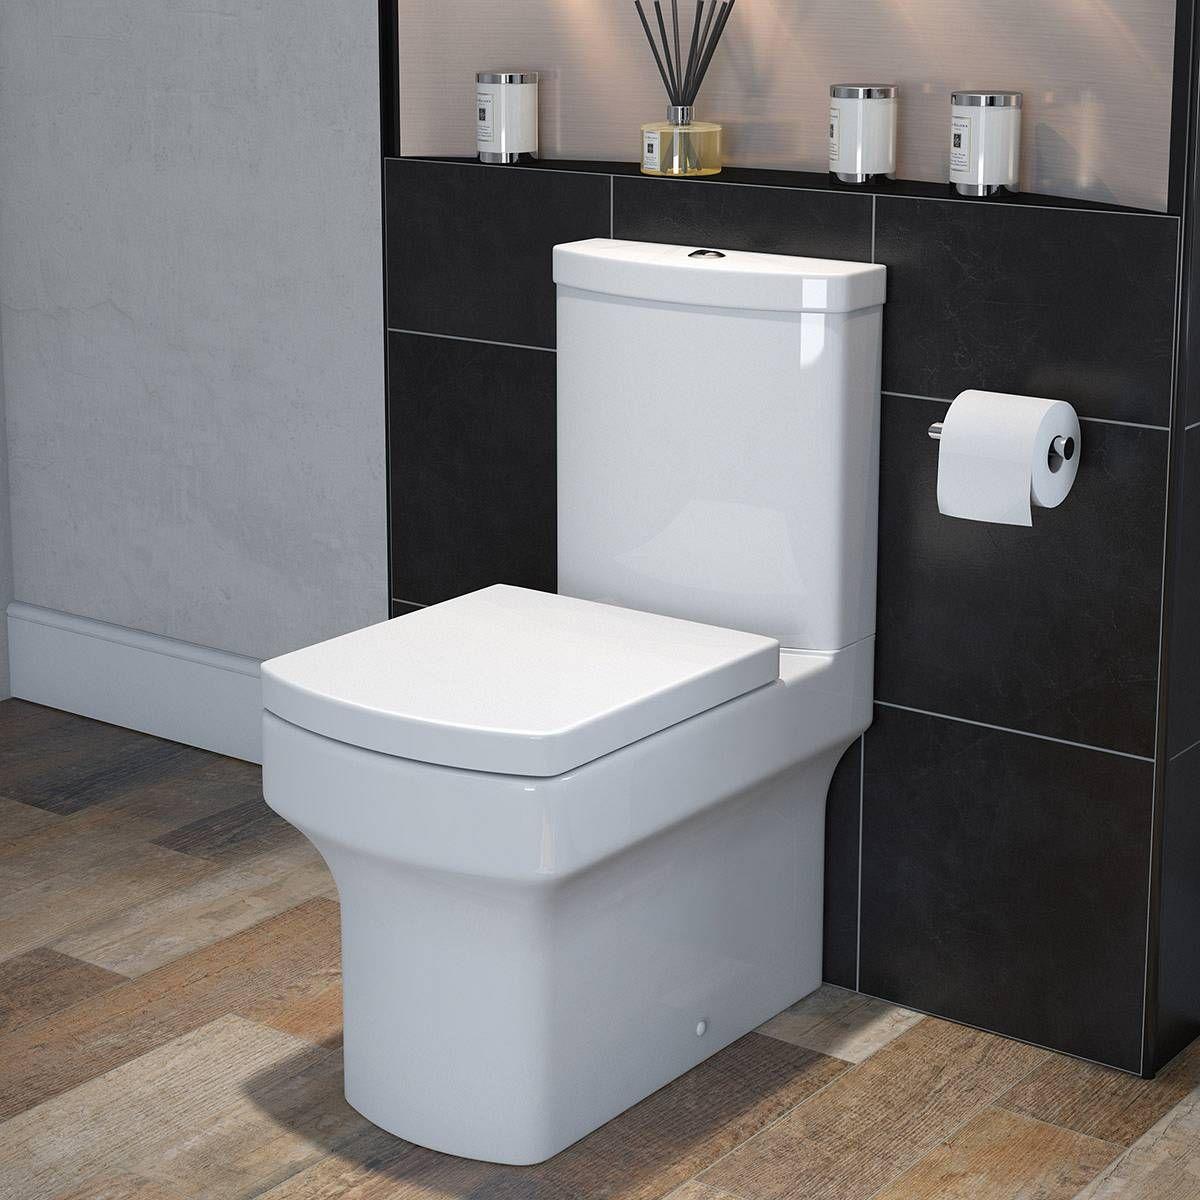 Vermont Close Coupled Toilet inc Soft Close Seat - Victoria Plumb ...